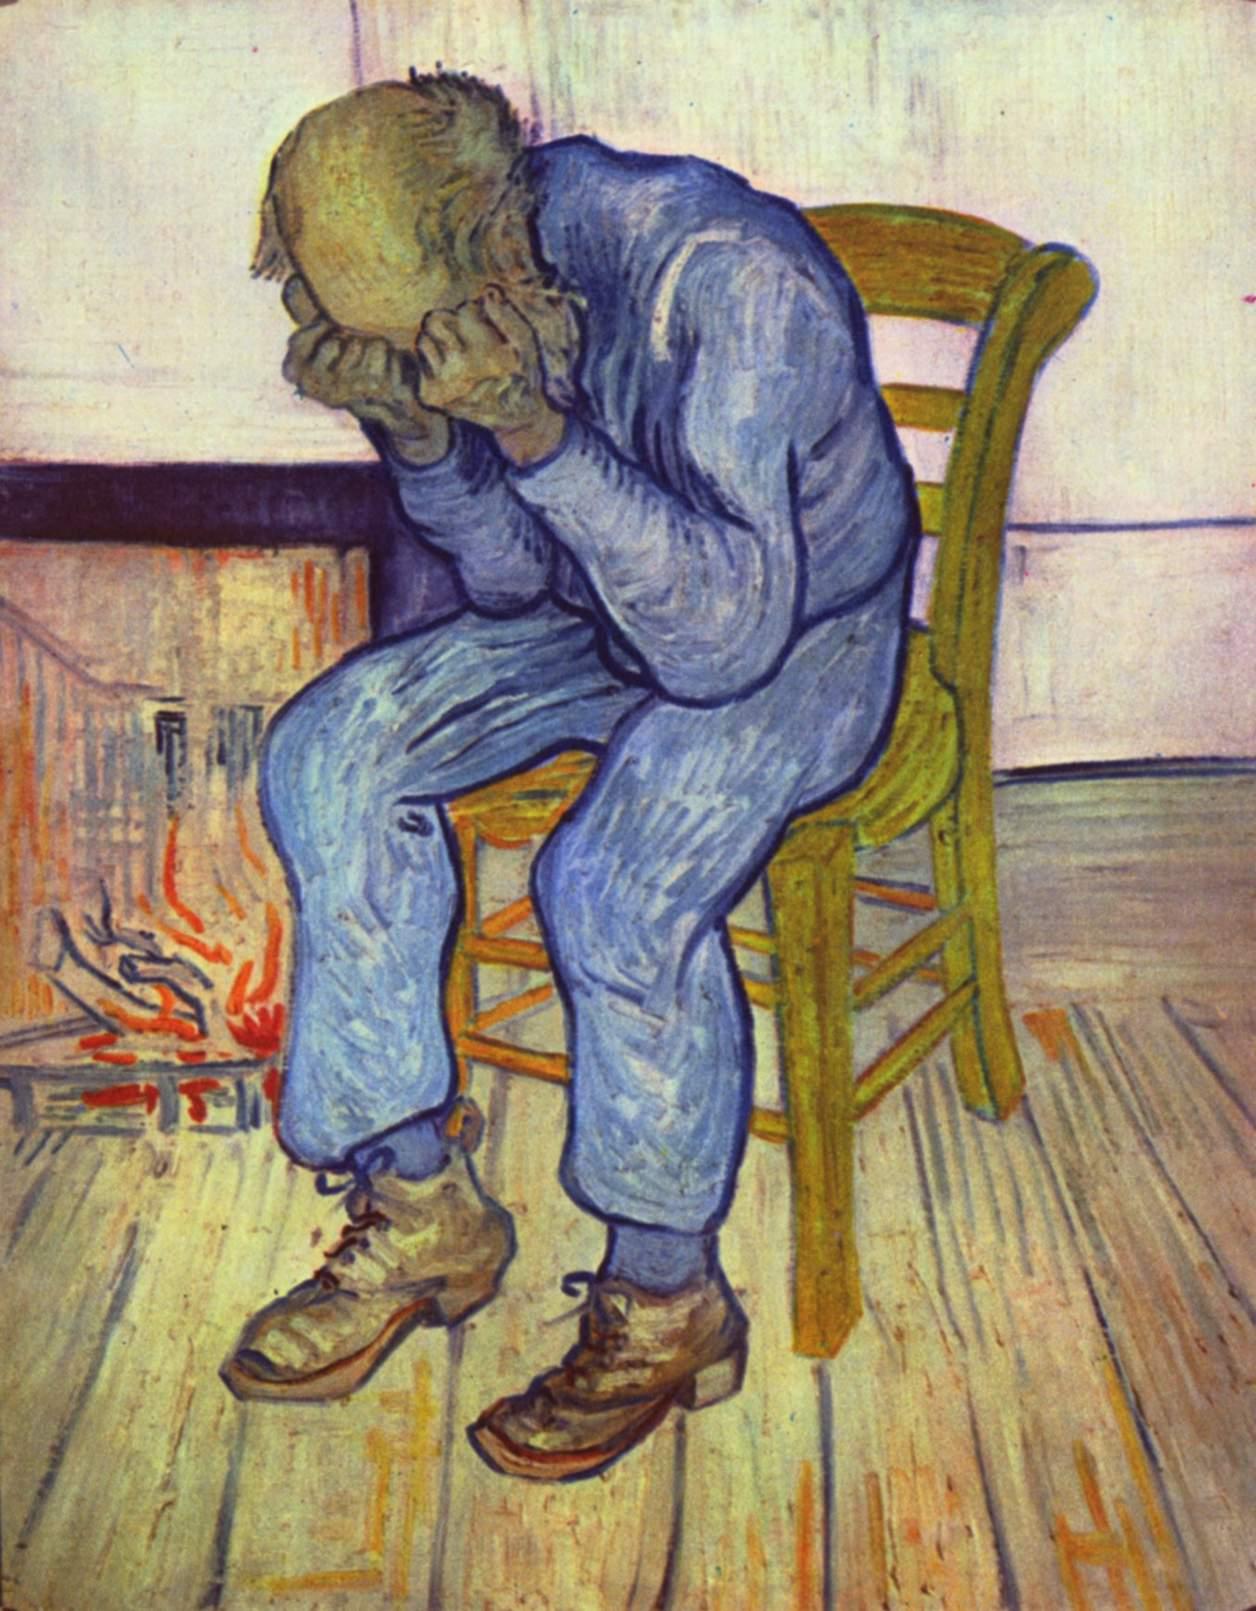 Vincent_Willem_van_Gogh_002.jpg